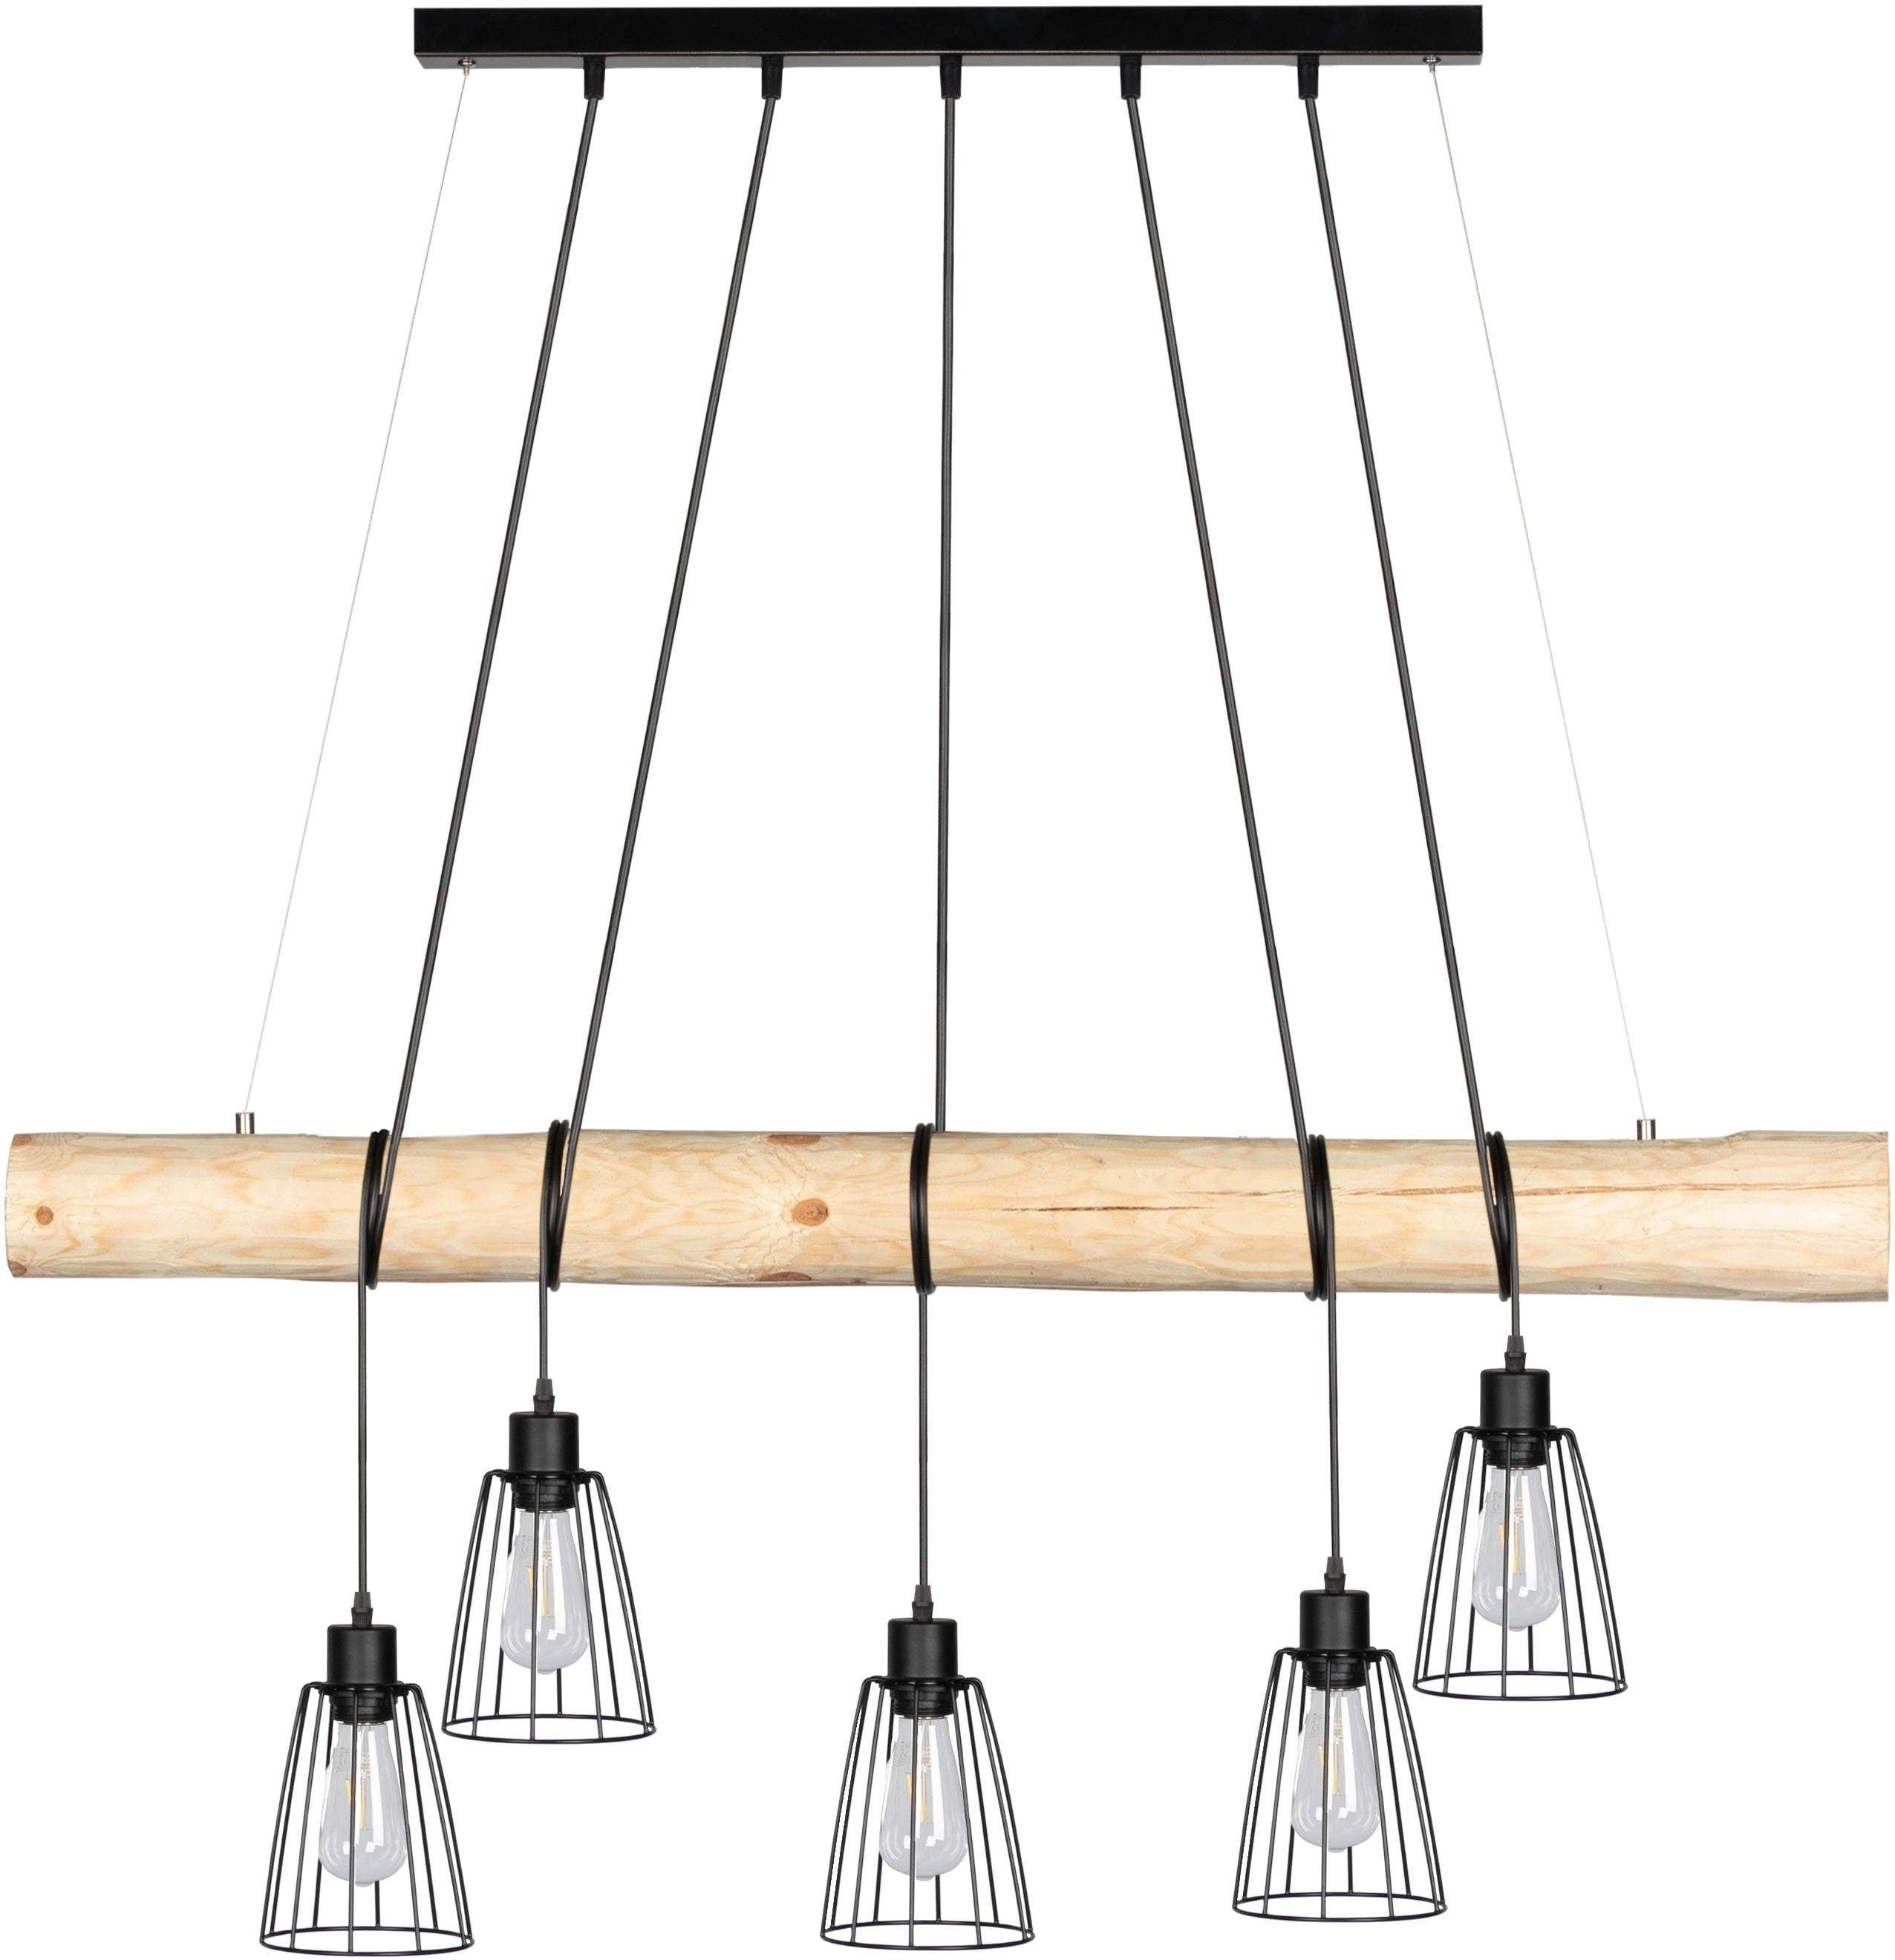 SPOT Light Pendelleuchte TRABO LONG, E27, Hängeleuchte, mit Massivholzbalken Ø 8-12 cm, Naturprodukt mit FSC-zertifikat, Kürzbar, passende LM E27, Made in Europe